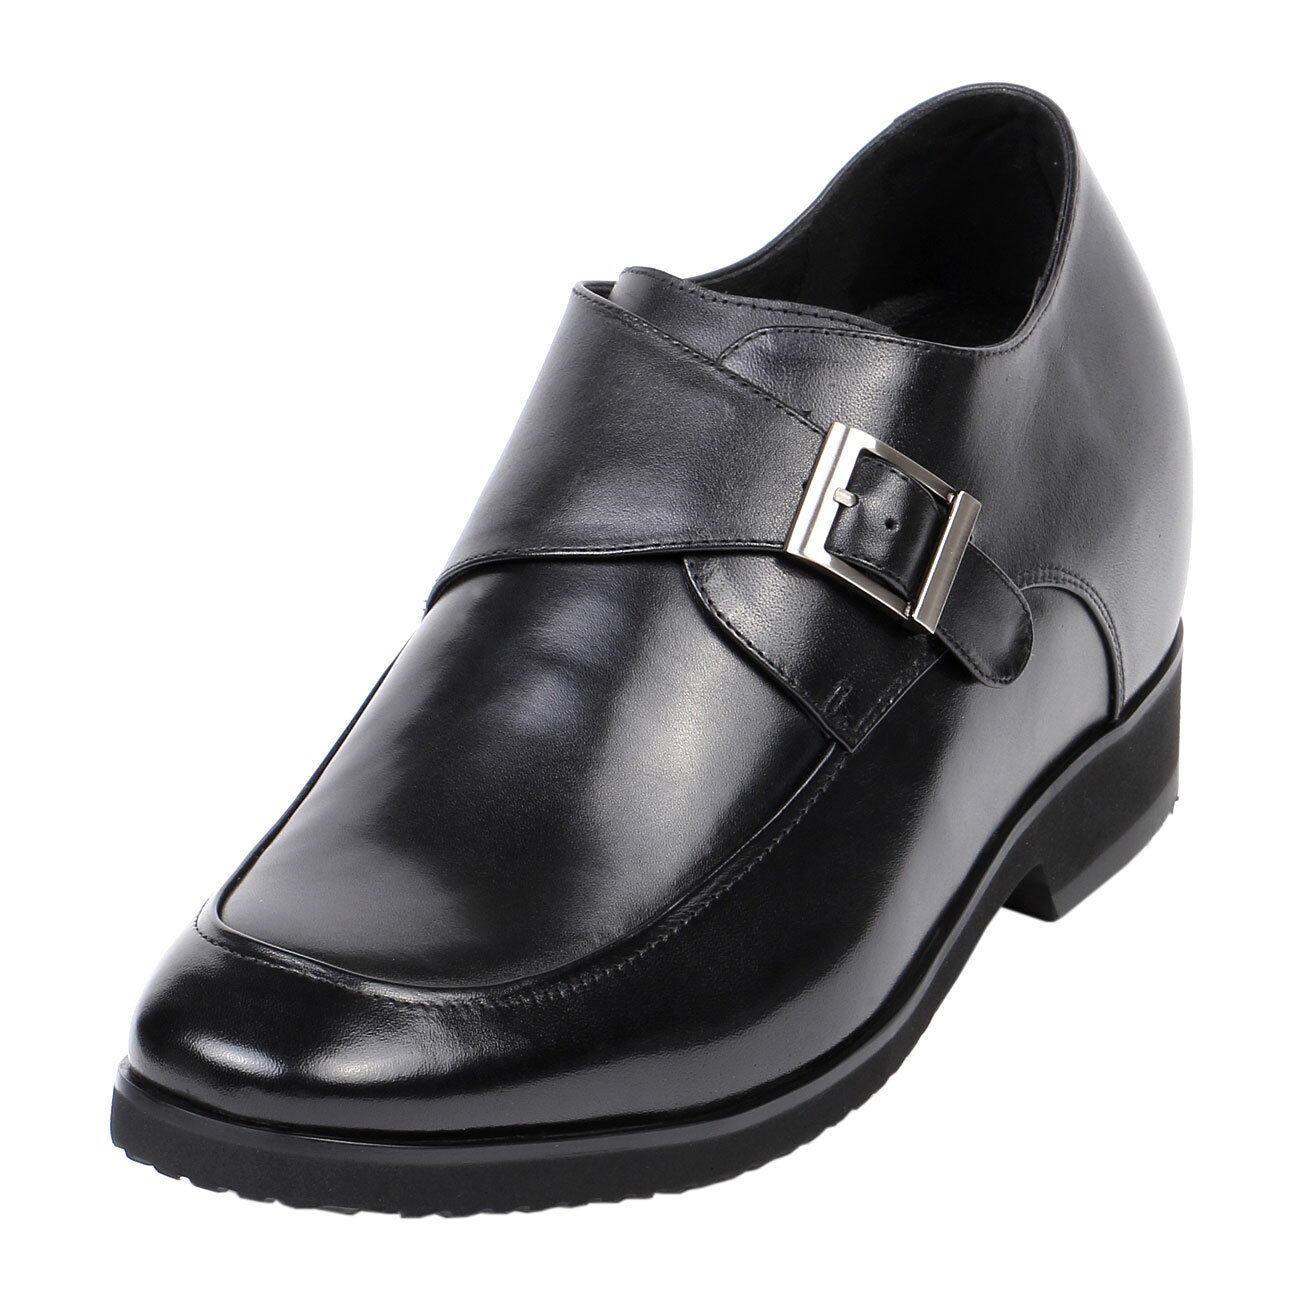 EXtra Height Elevator uomo Leather Make Shoes 4